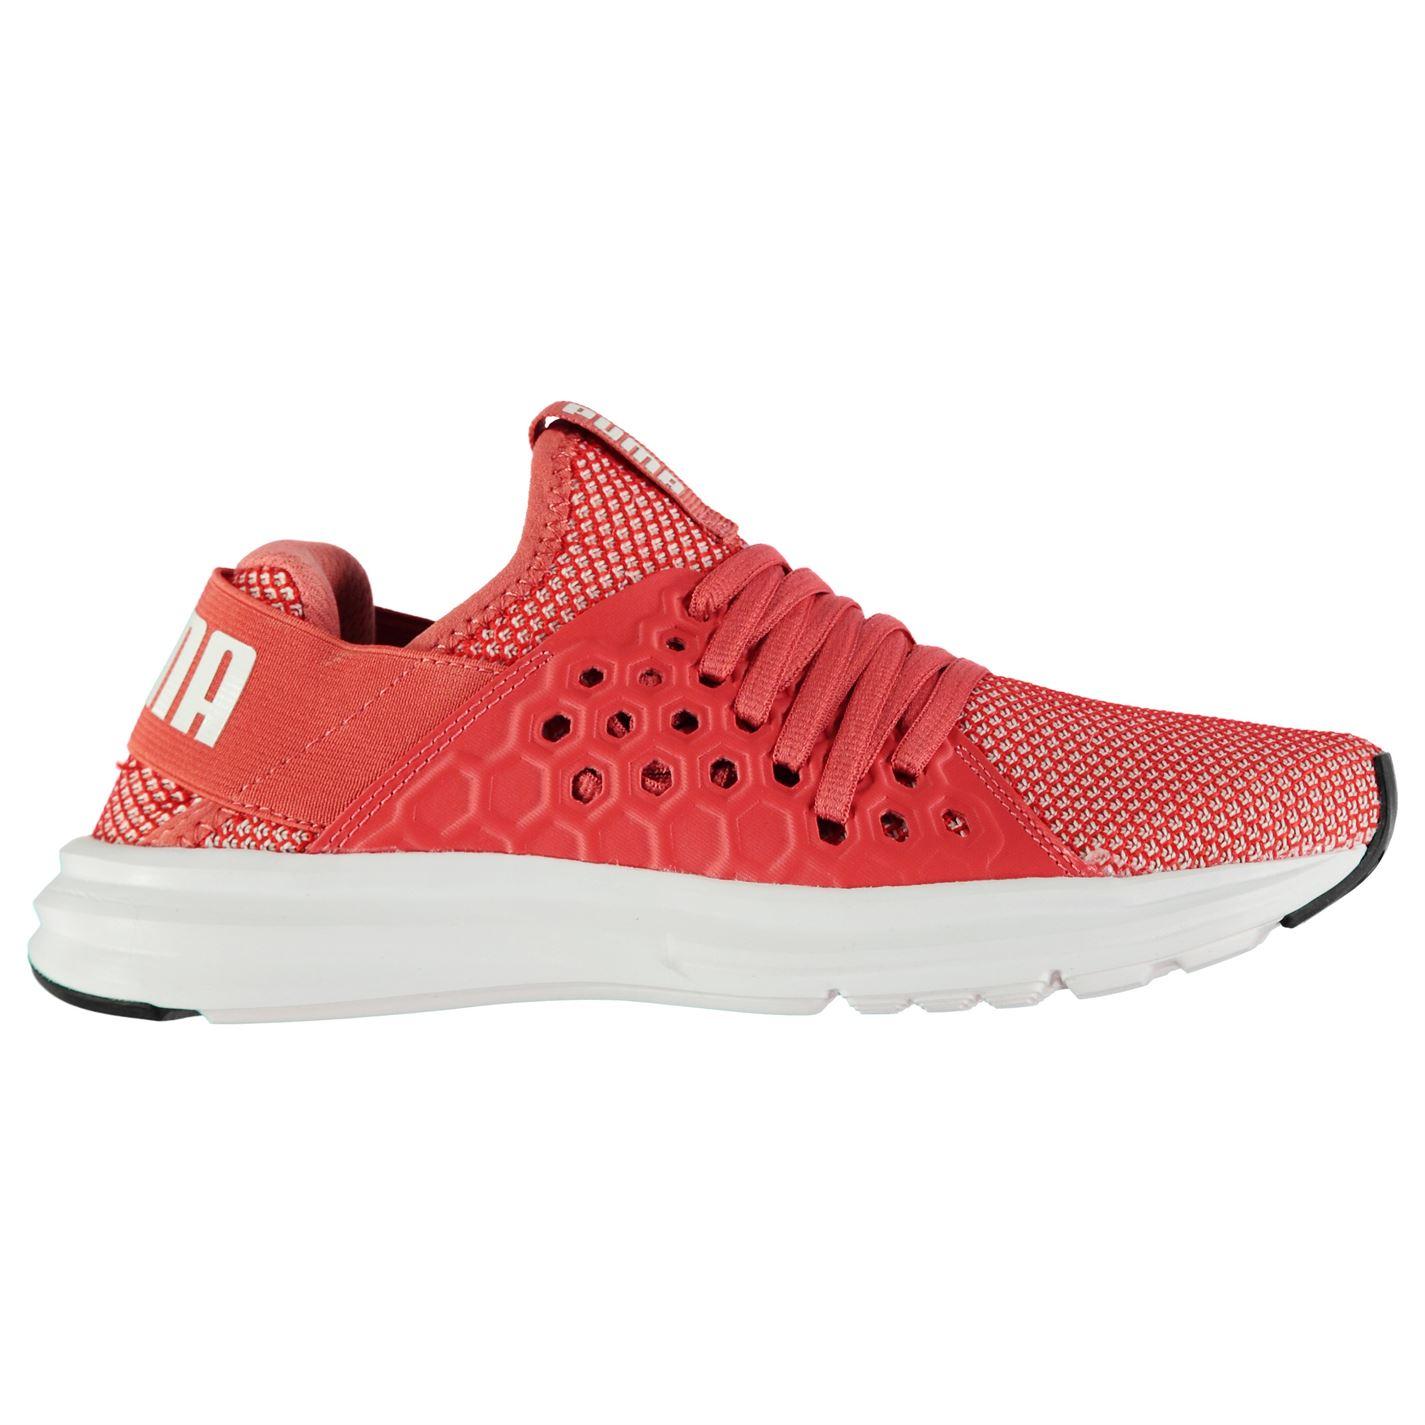 Mergi la Adidasi sport Puma Enzo NF pentru Femei rosu coral